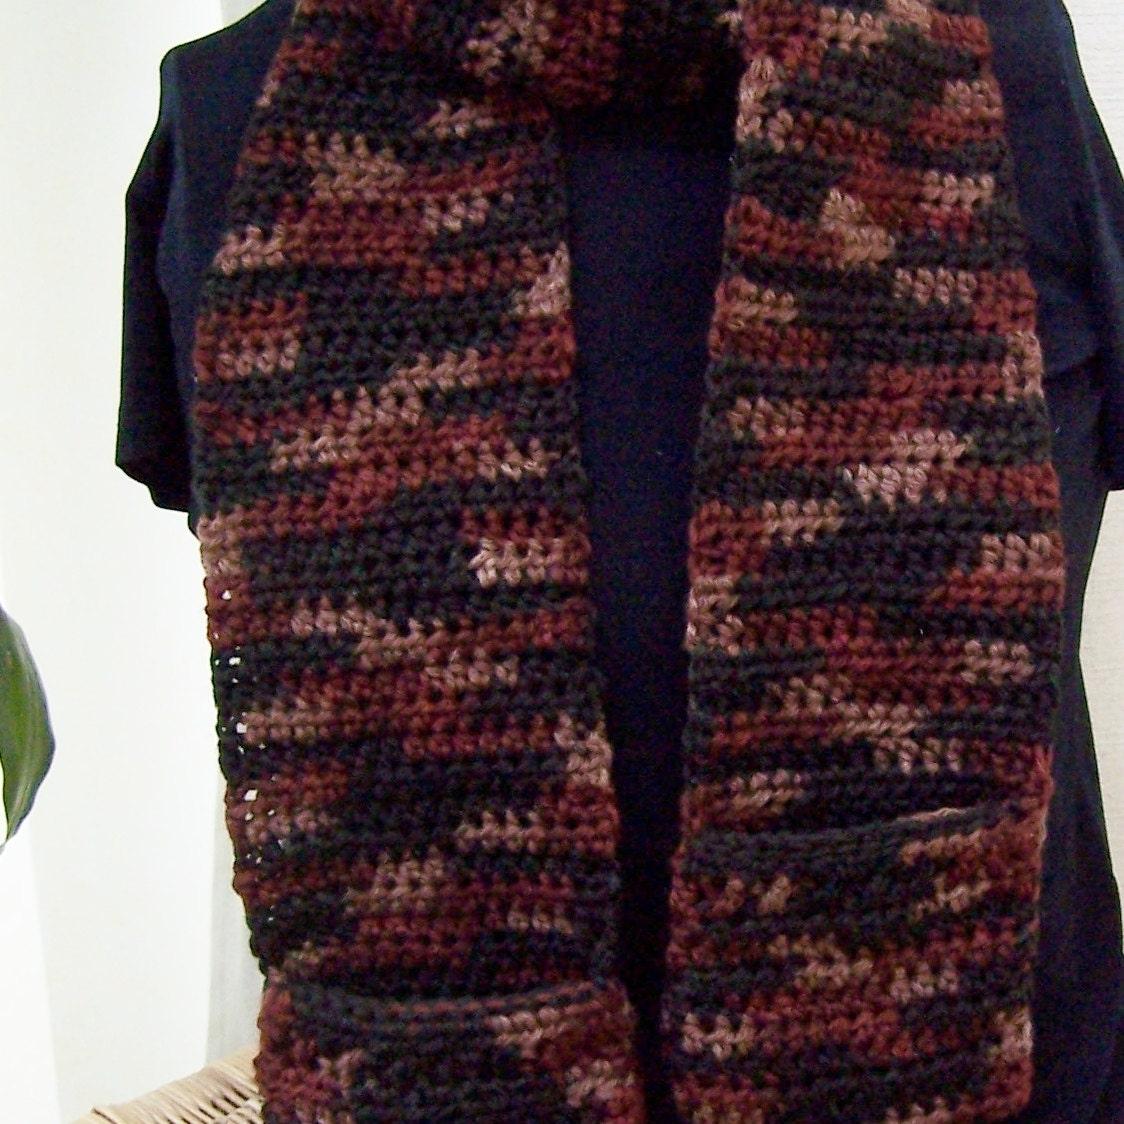 Crocheted Pocket Scarf Earth Tones by JadeRoseBoutique on Etsy